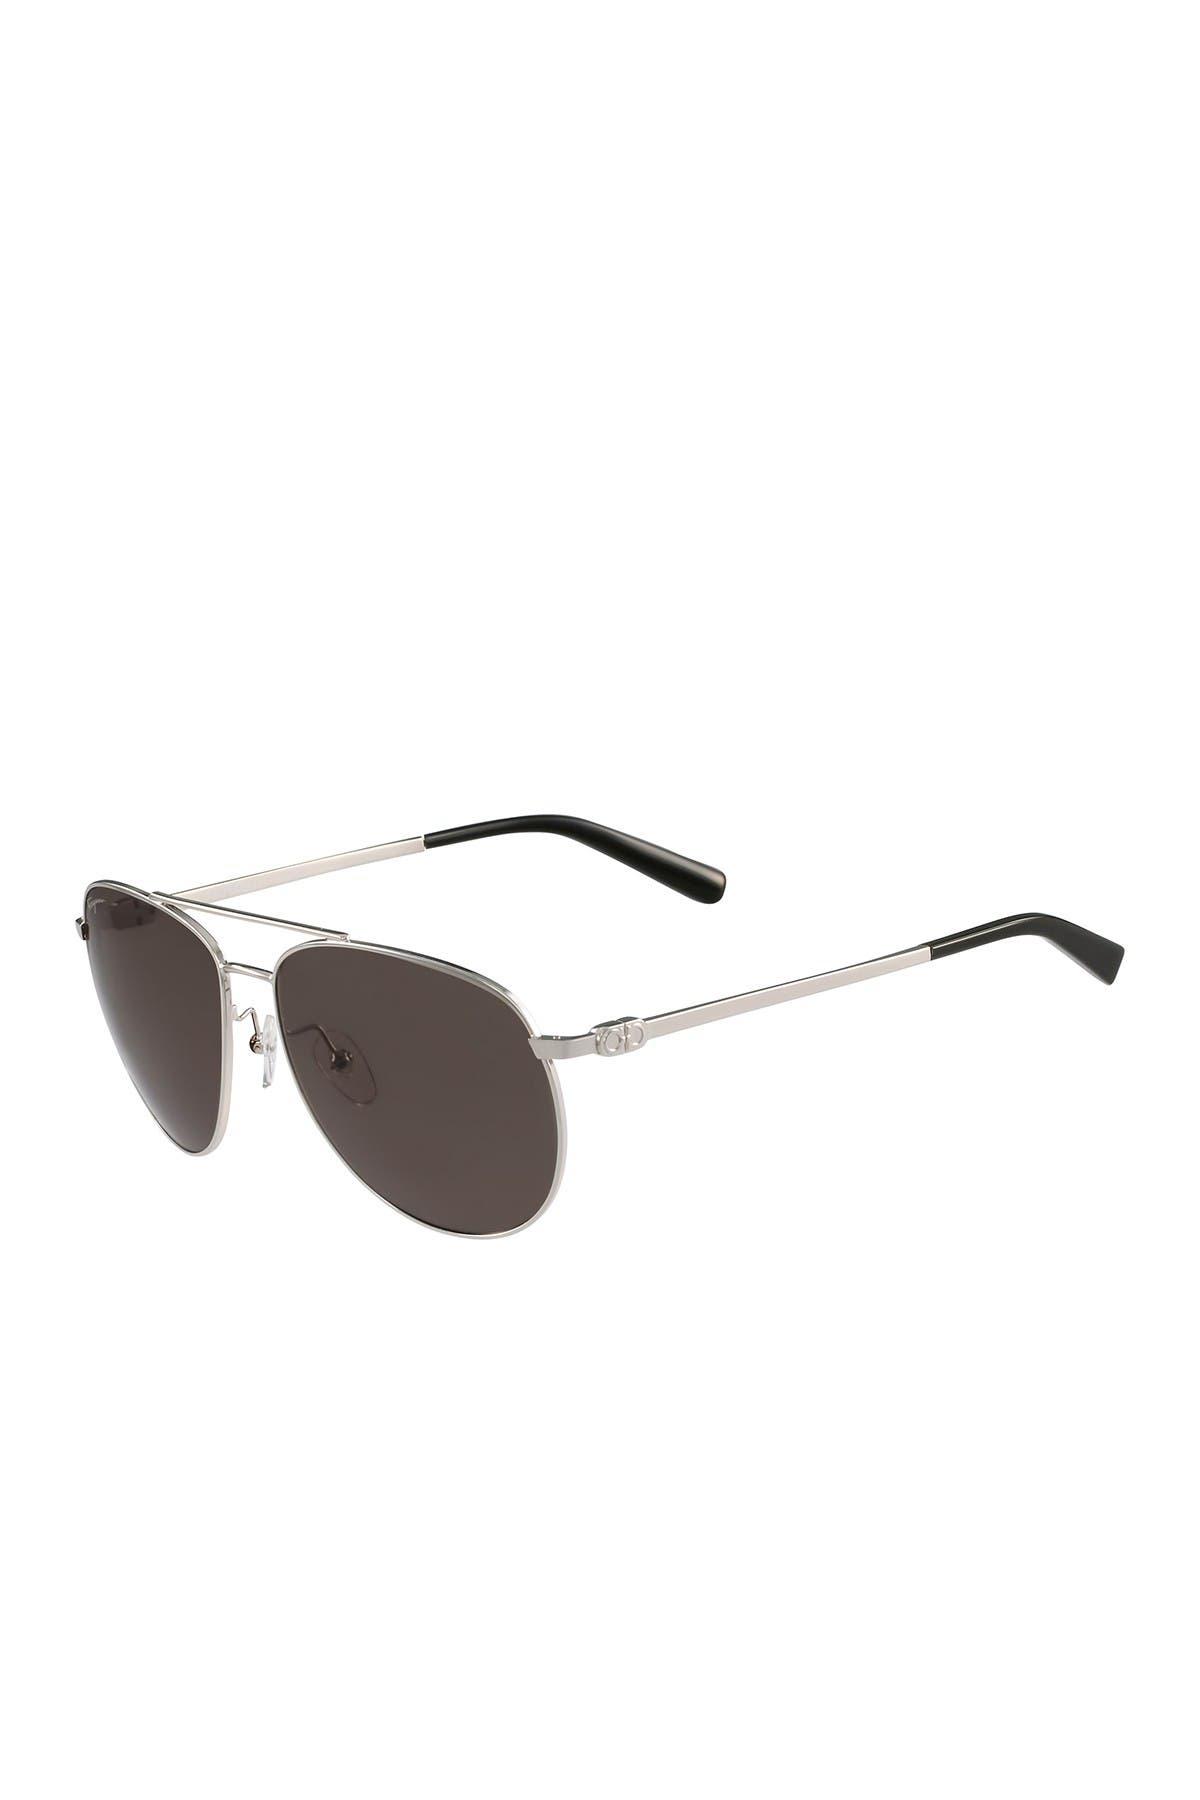 Image of Salvatore Ferragamo 60mm Aviator Sunglasses